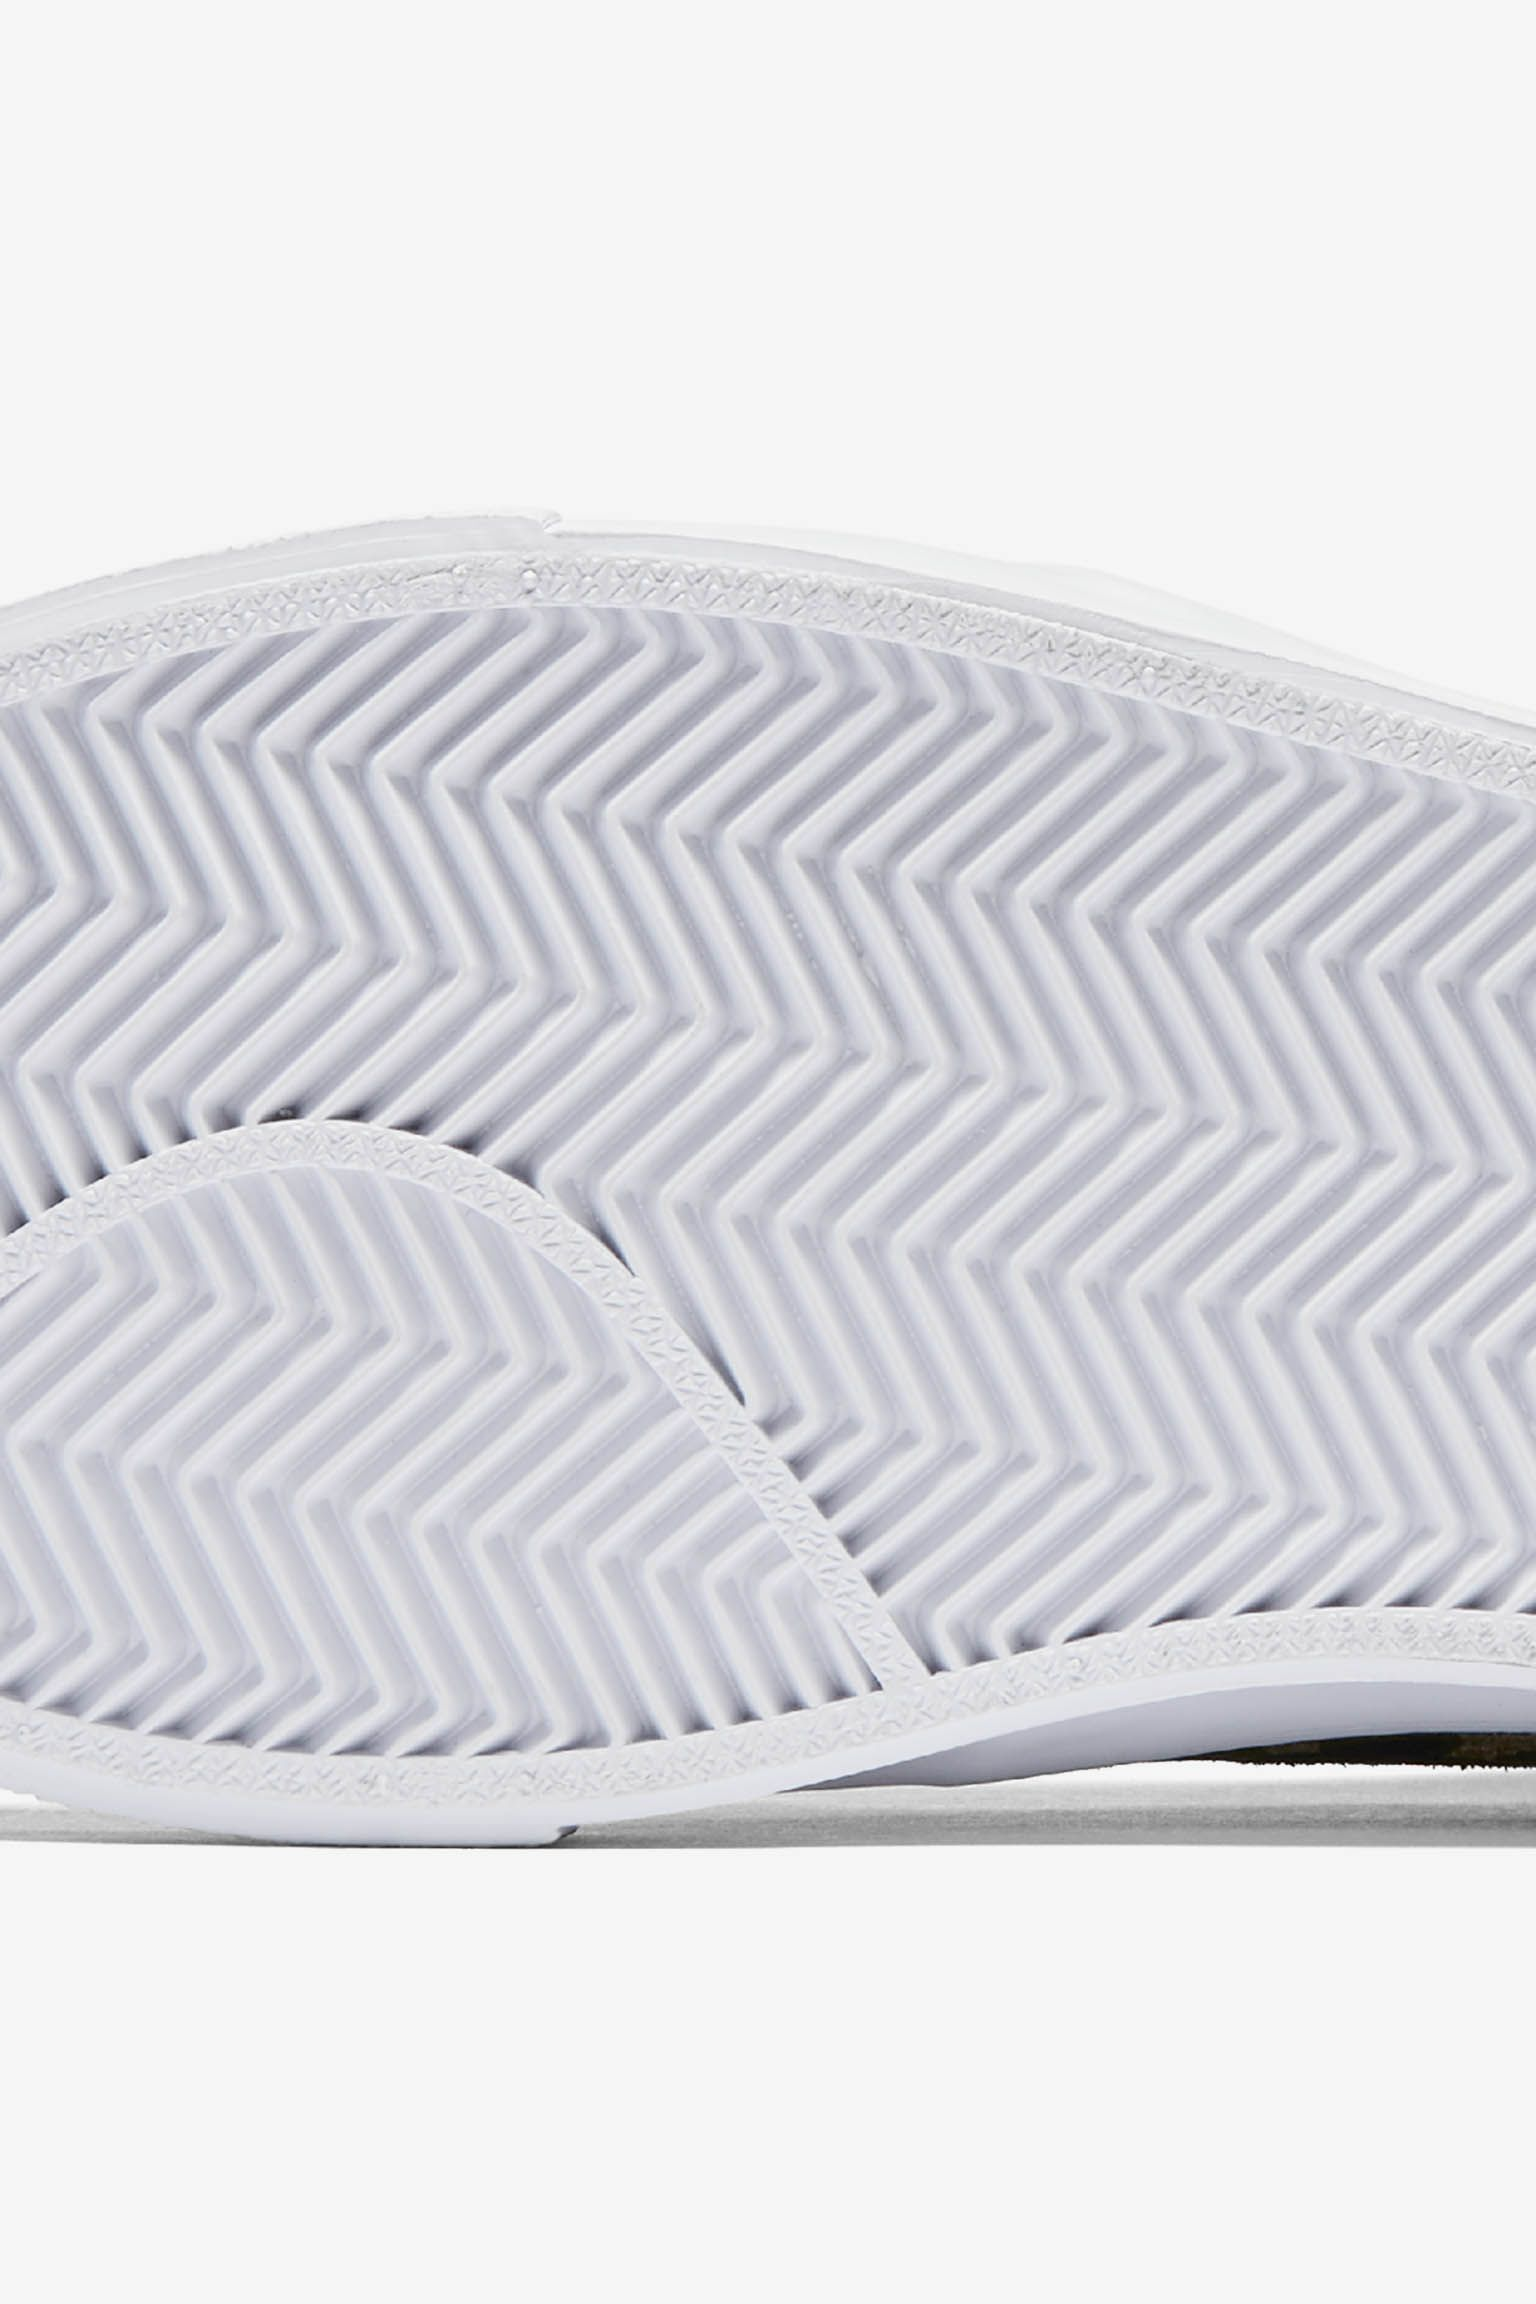 Nike SB Zoom Stefan Janoski High Tape 'Camo Green'